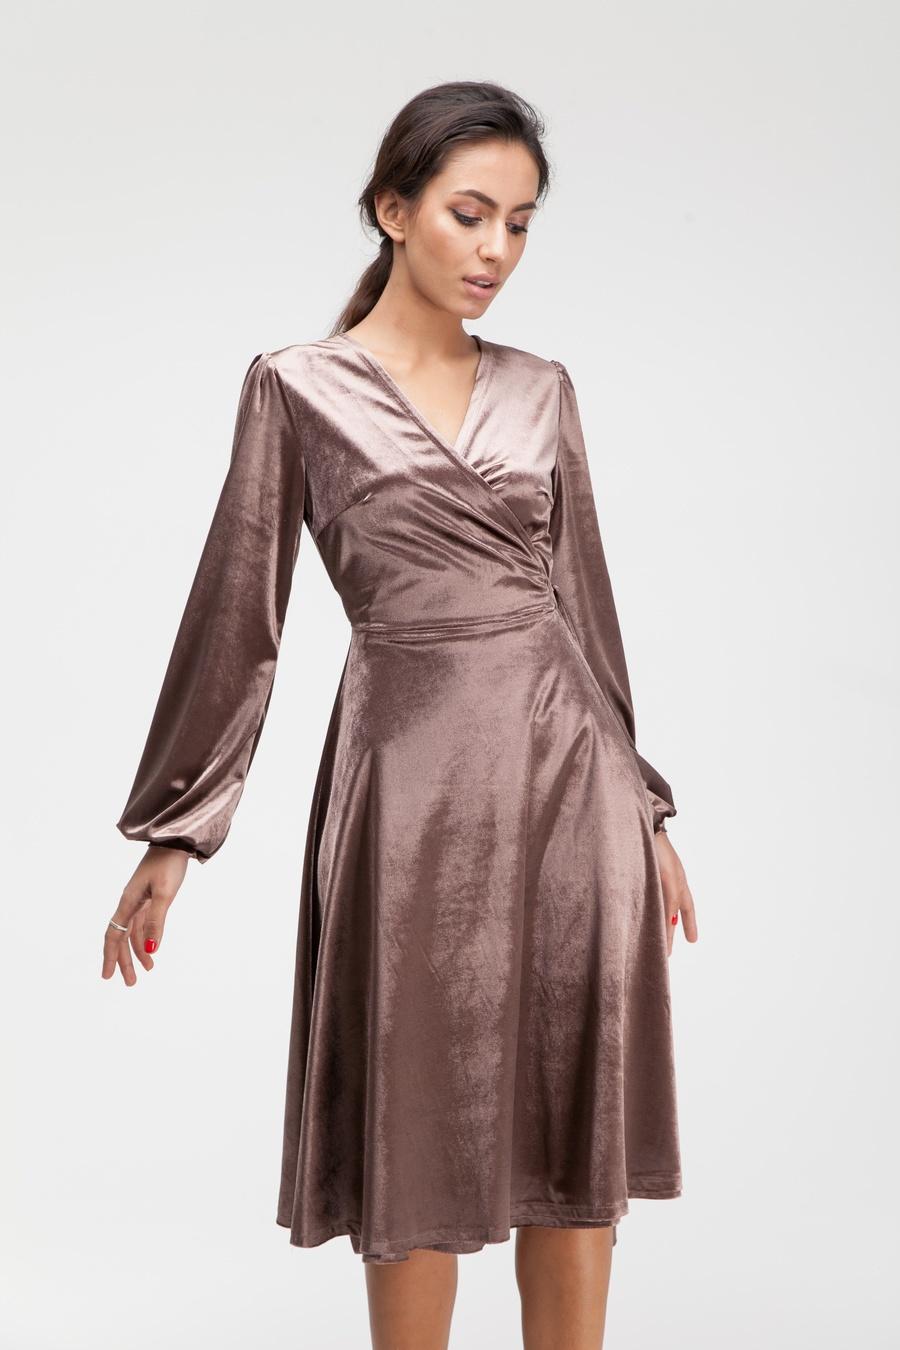 Платье миди на запах из бархата капучино - THE LACE